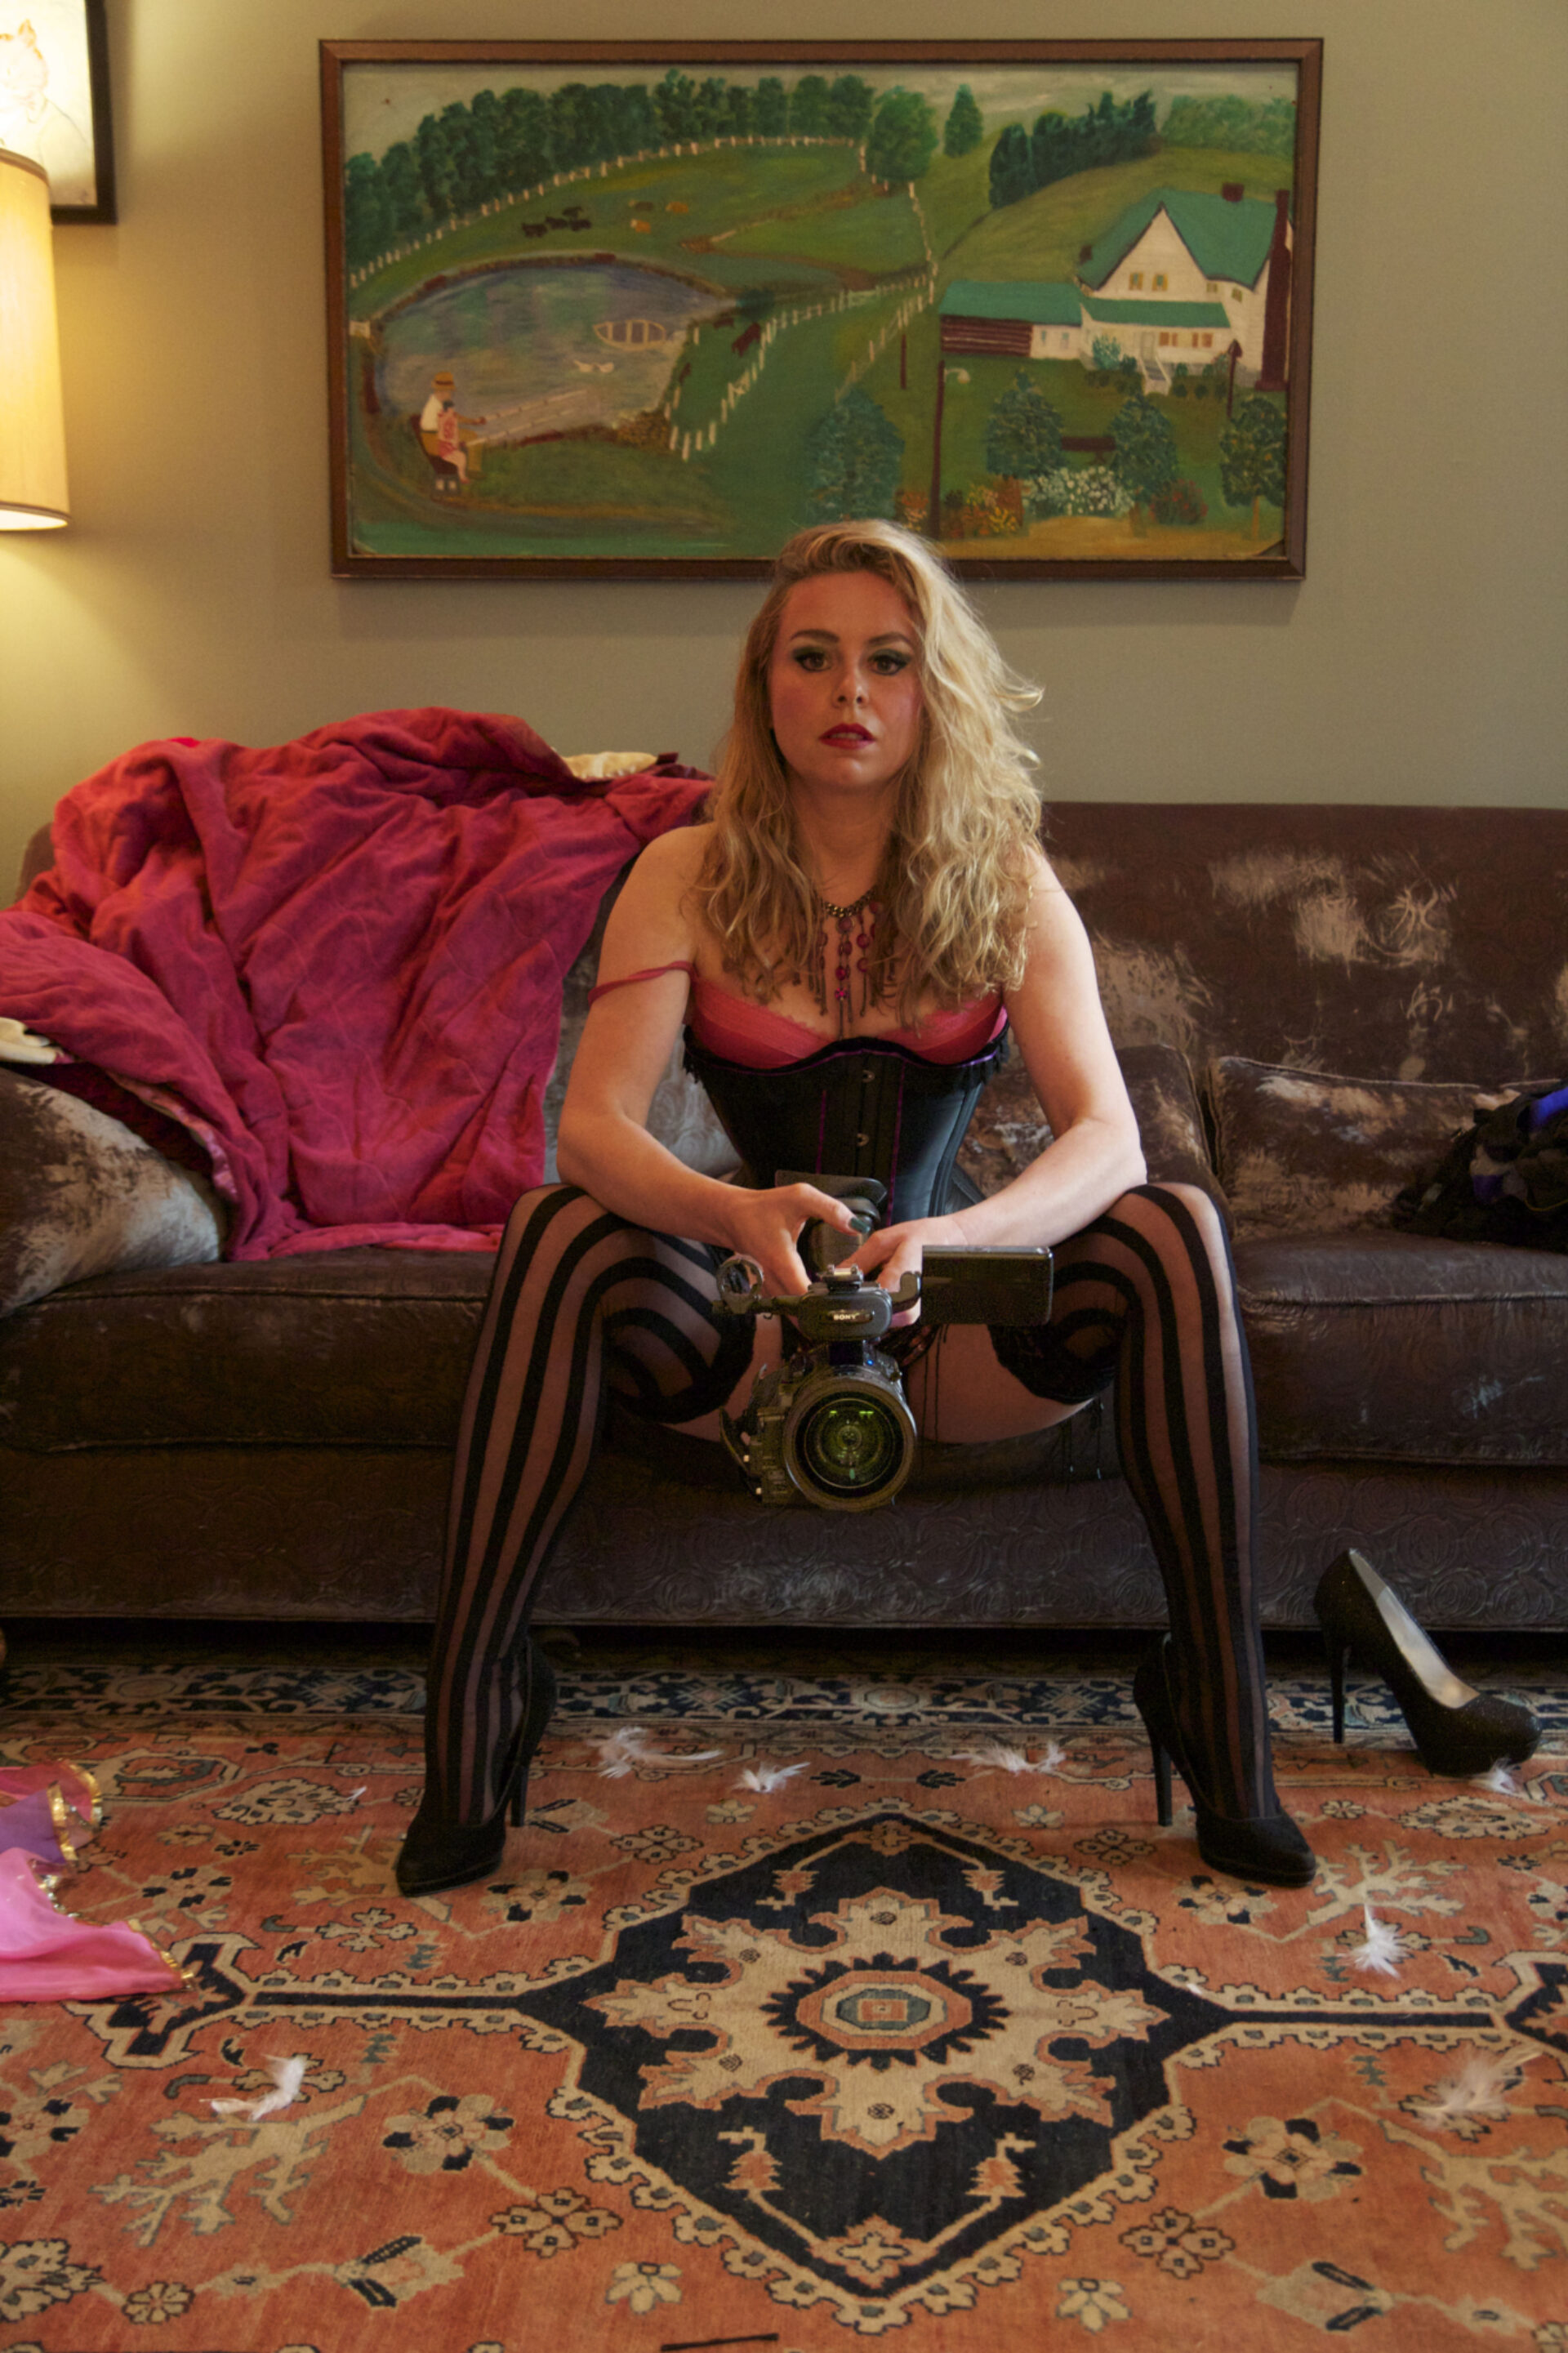 Prostitutes in Netherlands